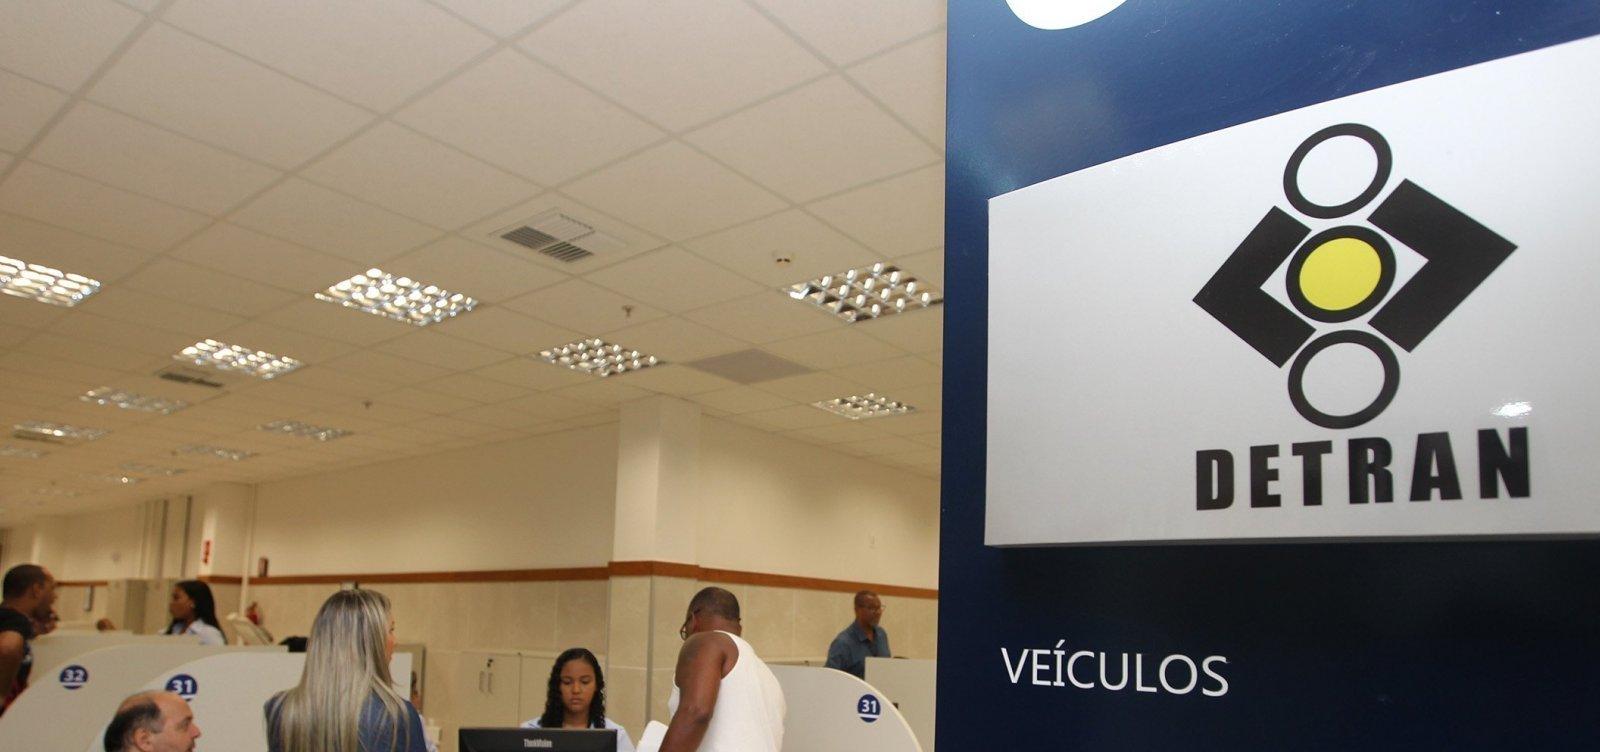 Detran-BA anuncia uso de PIX para pagamentos de taxas e outros serviços